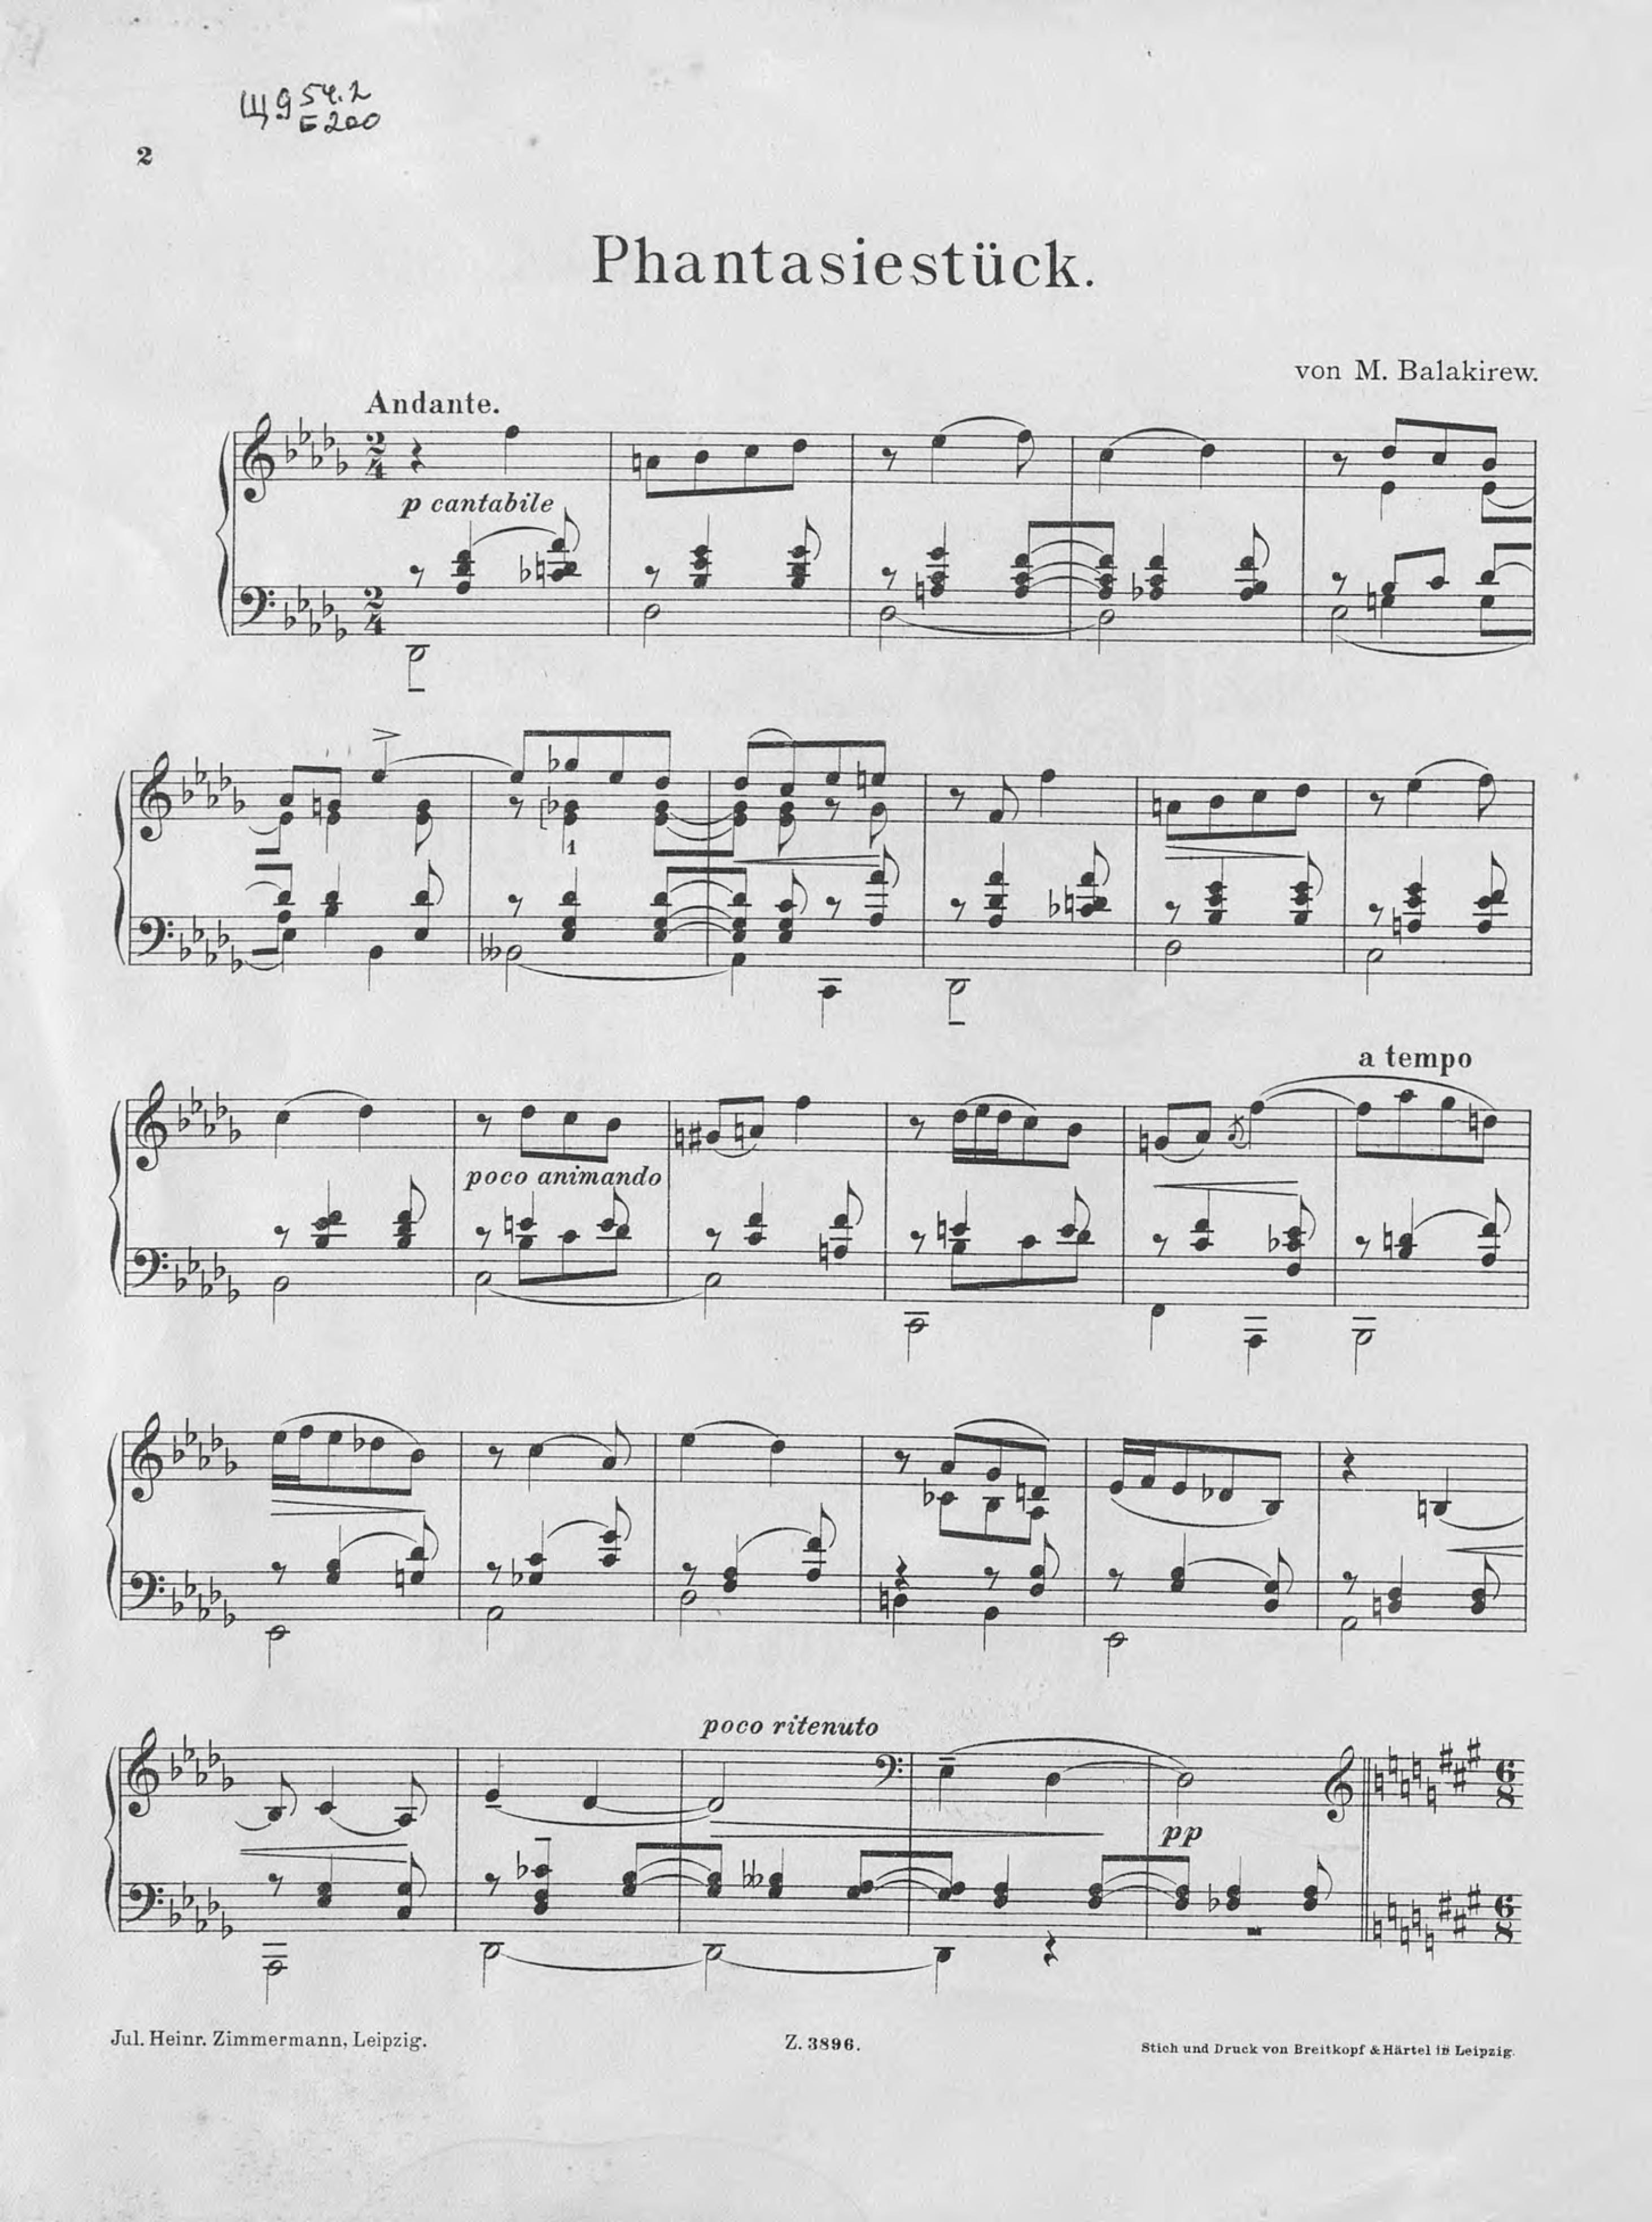 Милий Алексеевич Балакирев Phantasiestuck fur das Klavier g schumann 3 stucke fur klavier op 23